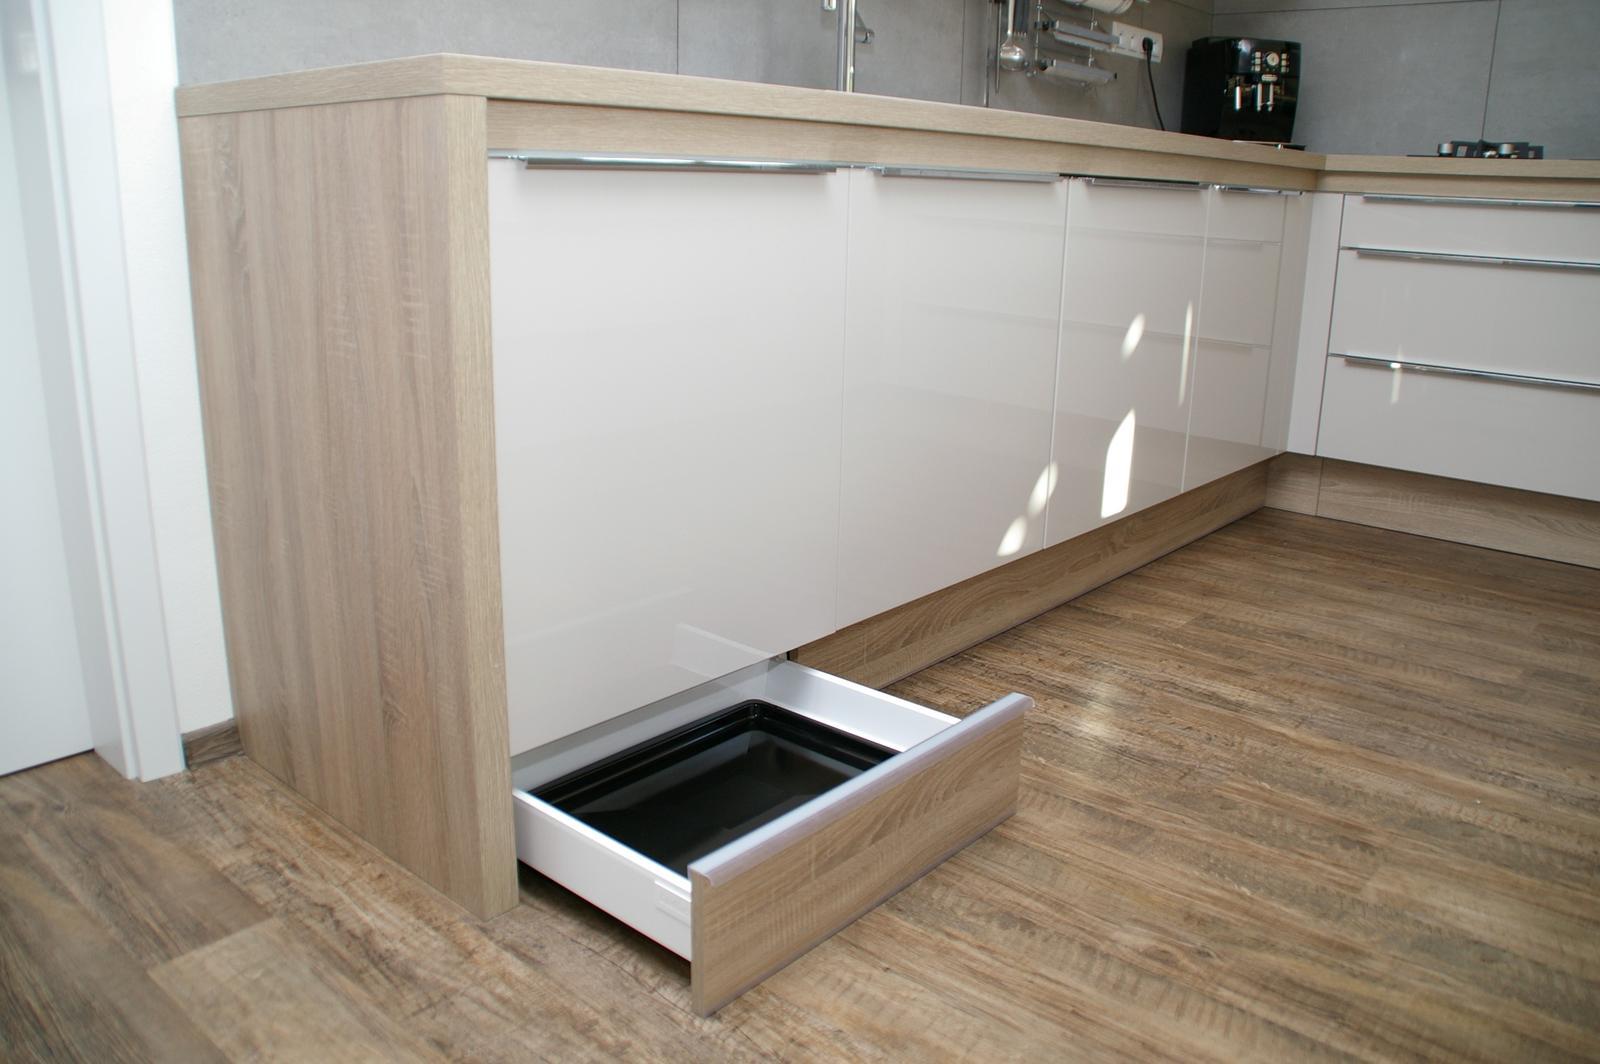 Naša kuchyňa - Obrázok č. 11